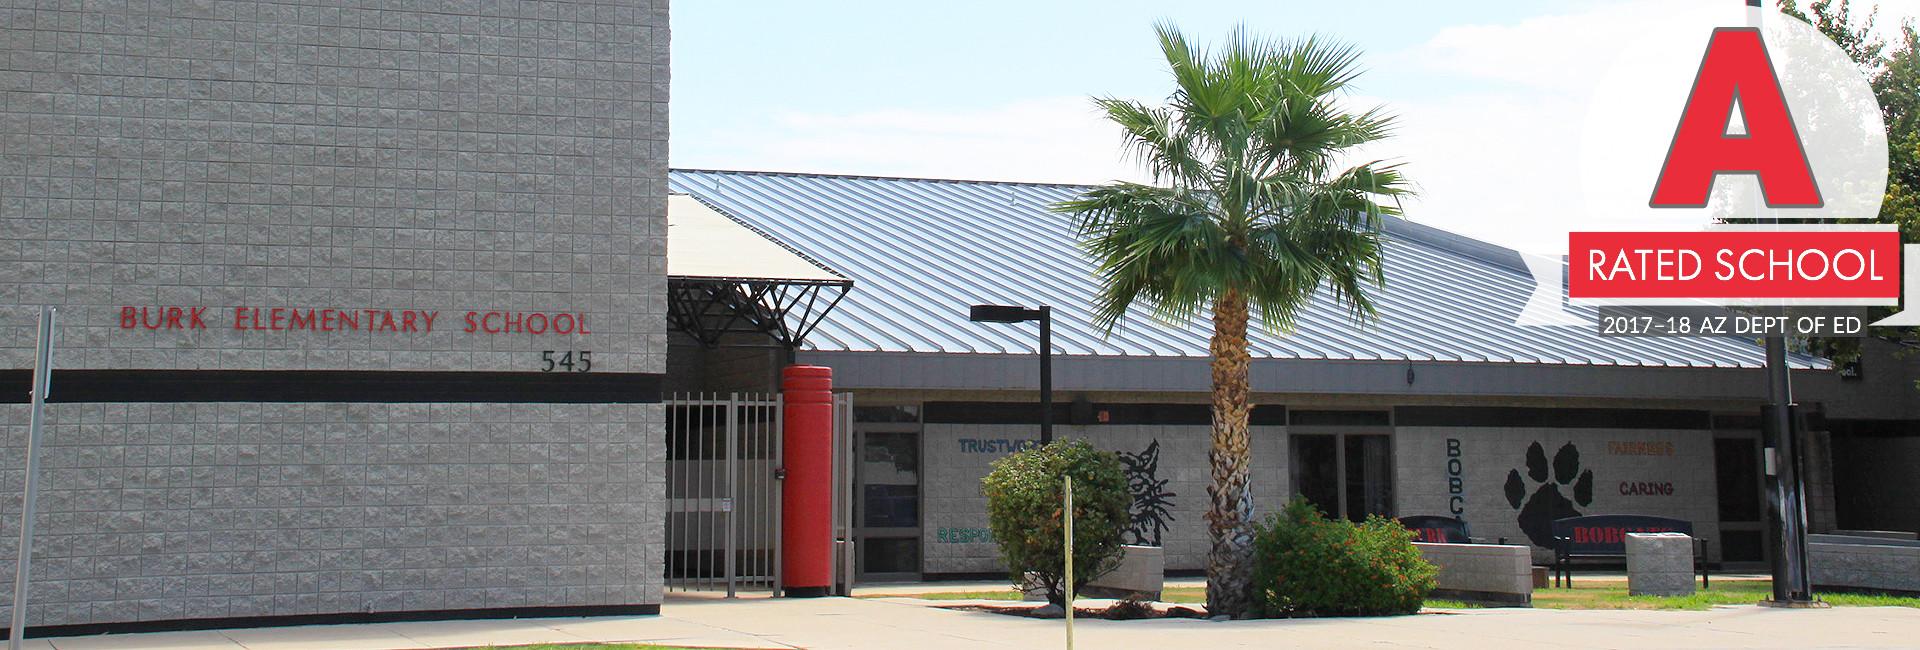 Burk Elementary.jpg